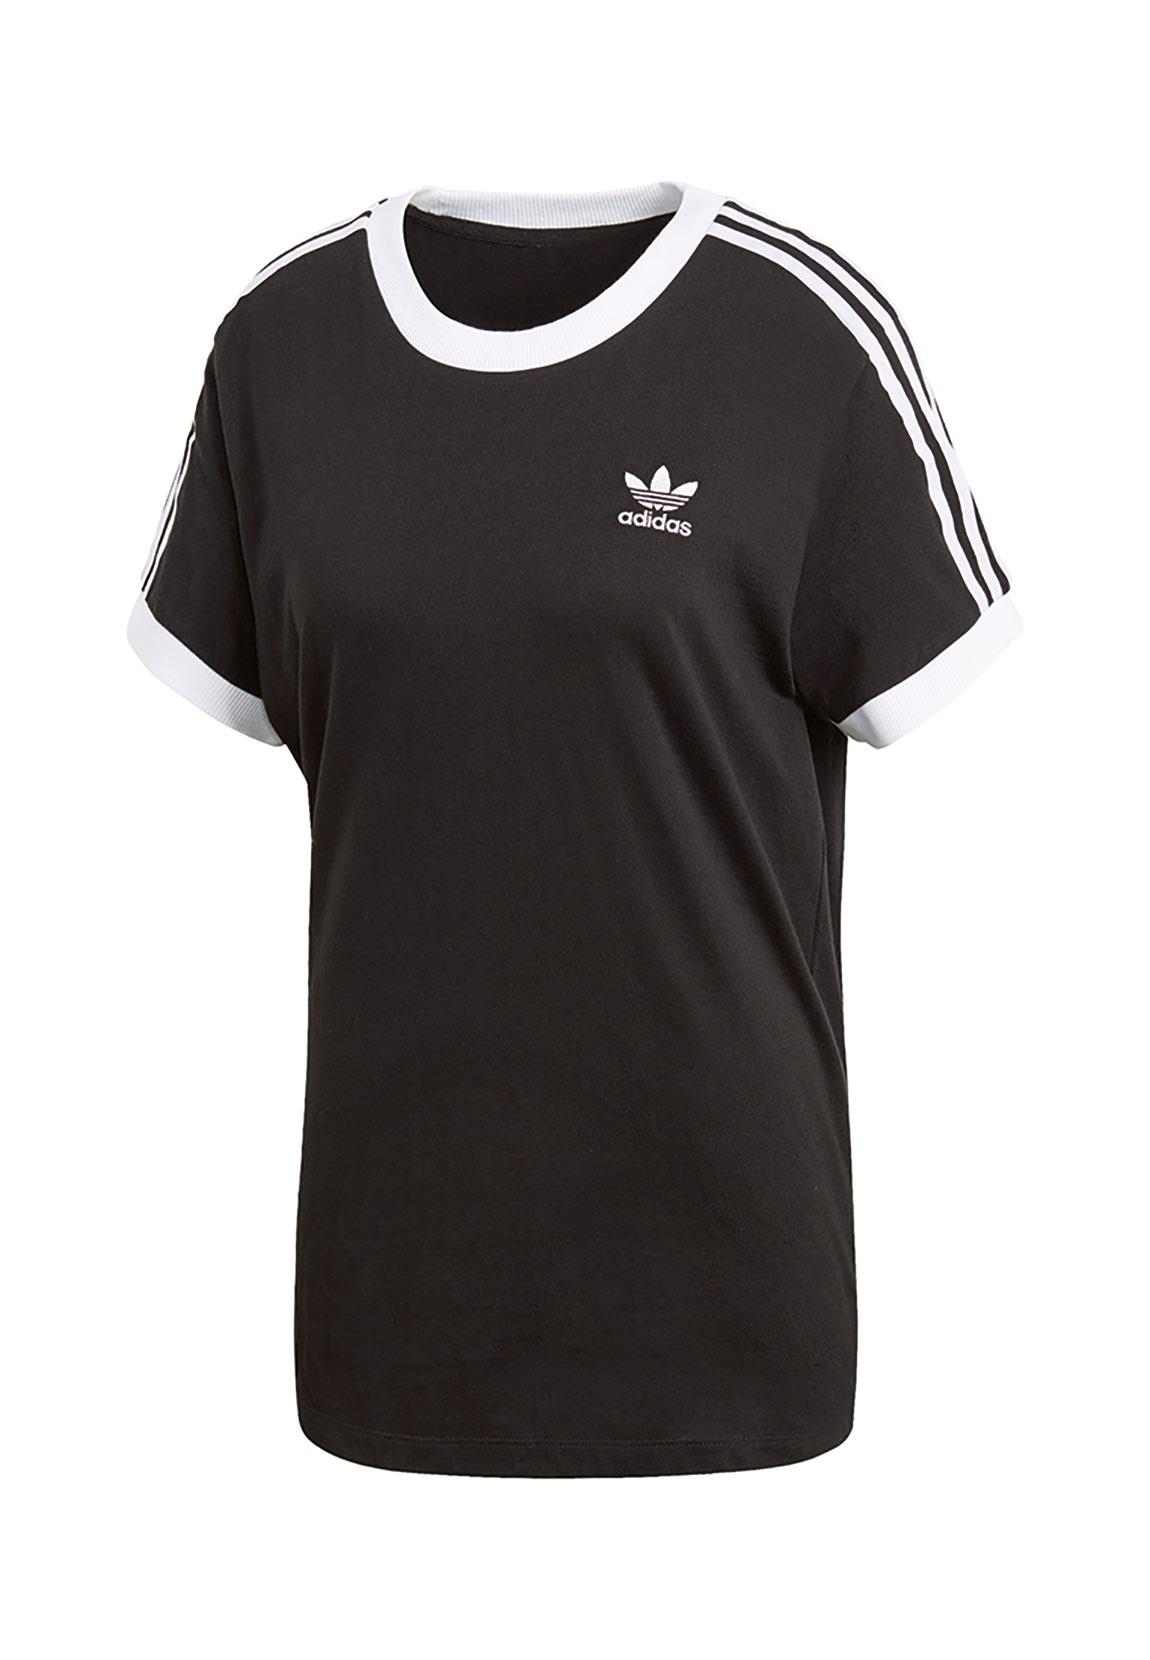 adidas 3stripes t-shirt damen